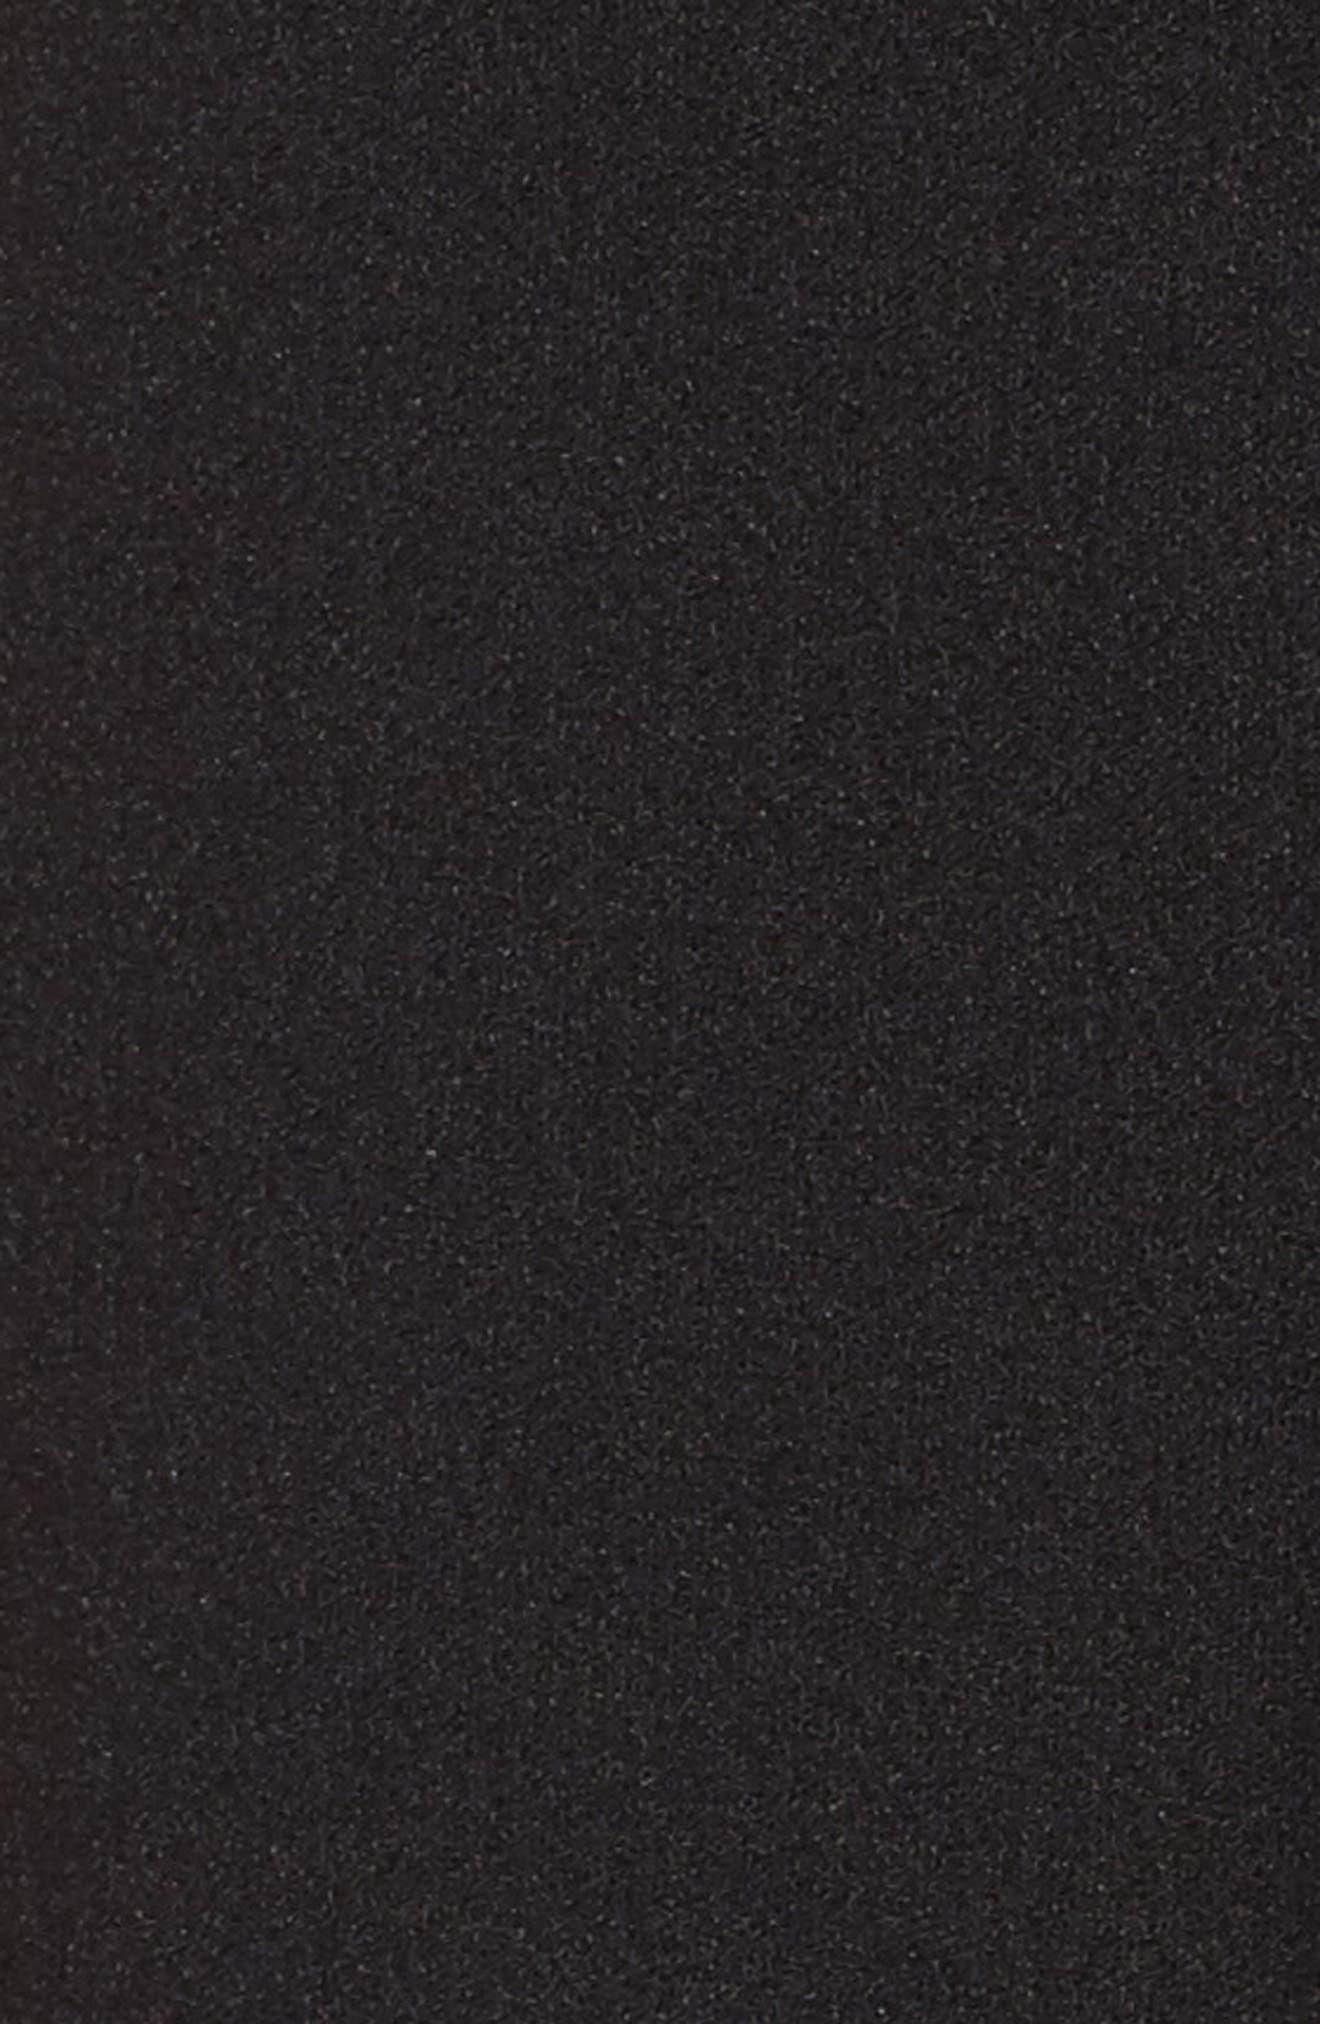 Tie Waist Shorts,                             Alternate thumbnail 5, color,                             001